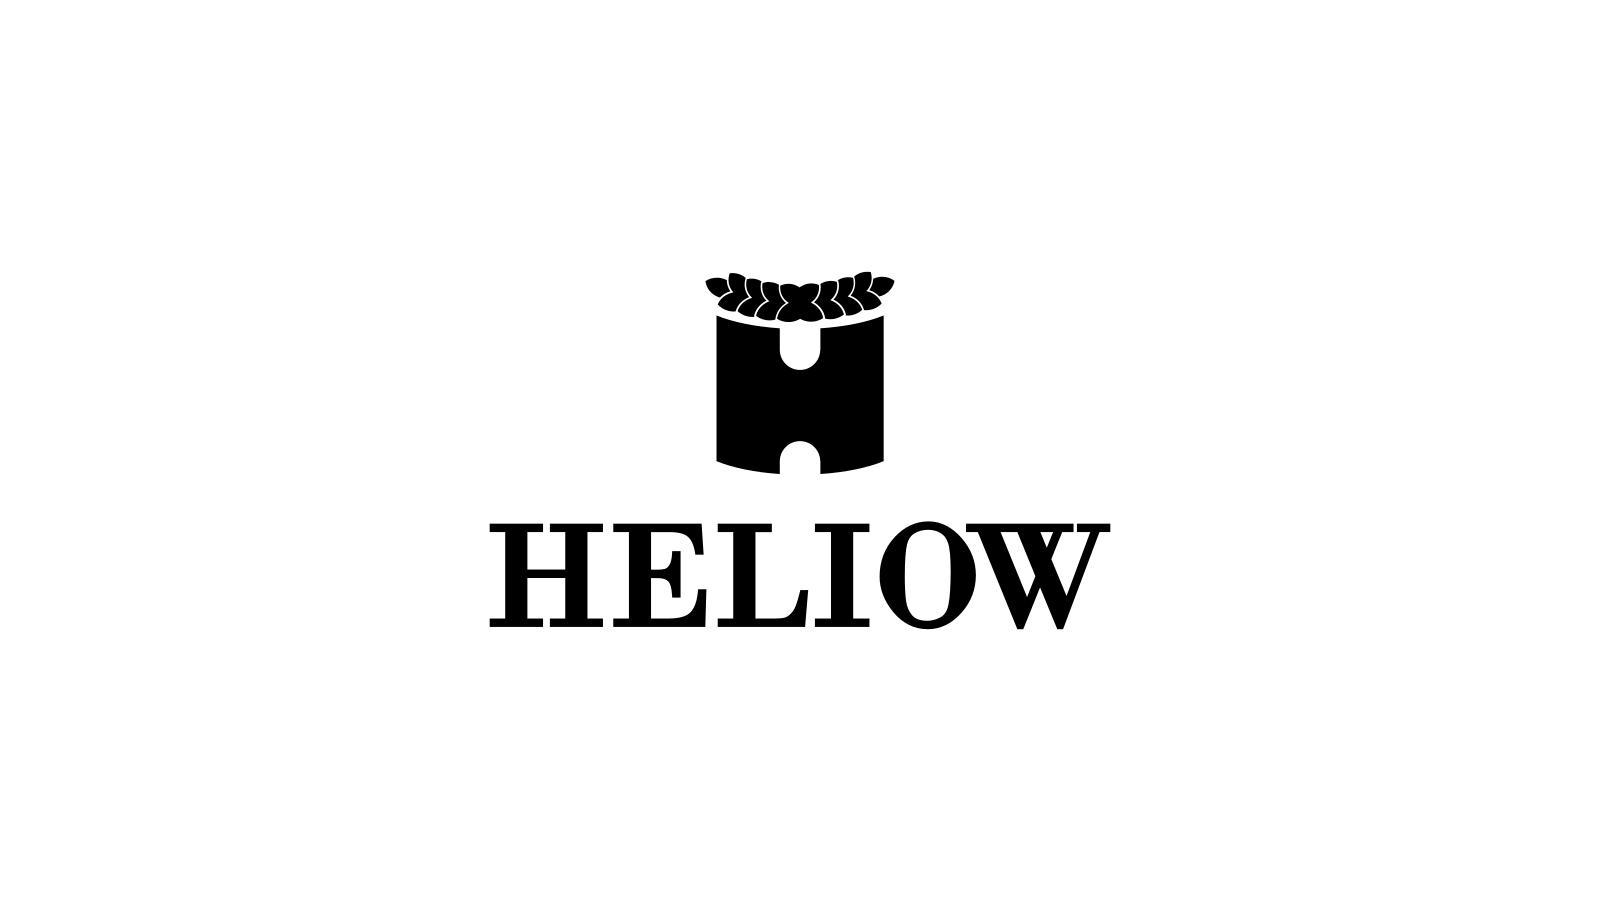 heliow logo in black and white